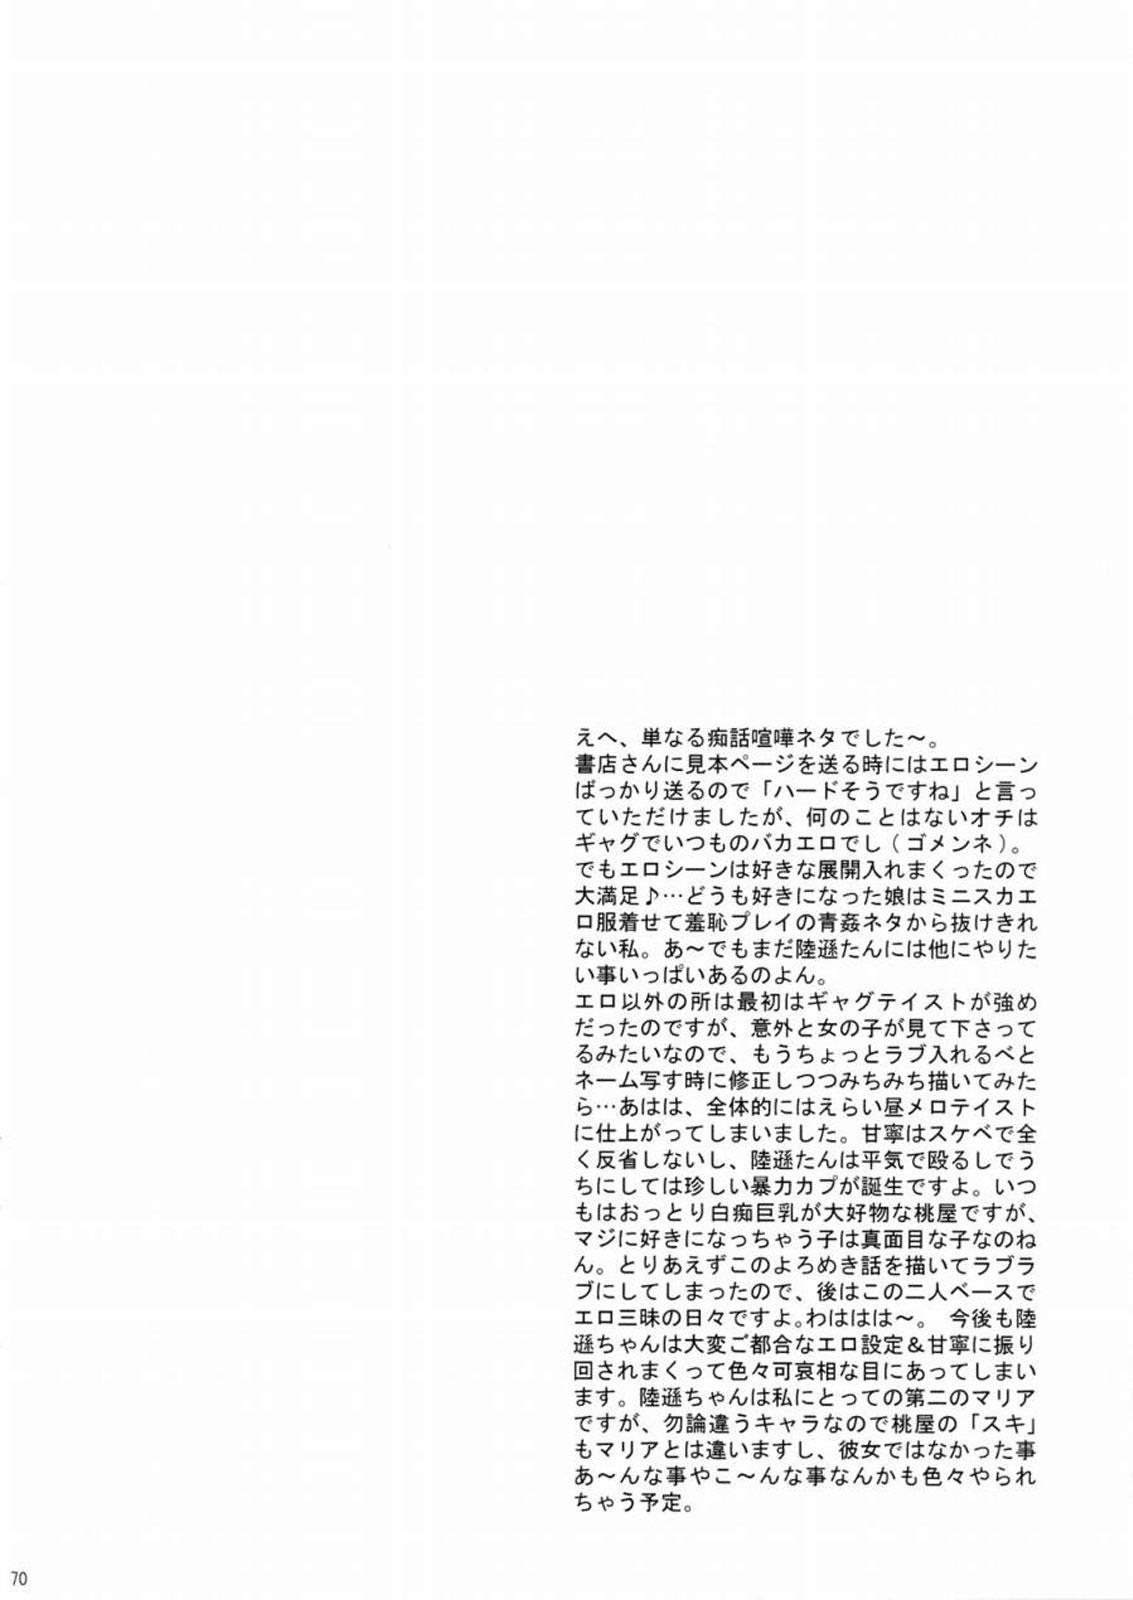 (C66) [U.R.C (Momoya Show-Neko)] Rikuson-chan ~Lovely Gunshi no Himitsu~ | Rikuson-chan Secret of The Lovely Strategist (Dynasty Warriors) [English] [SaHa] 68